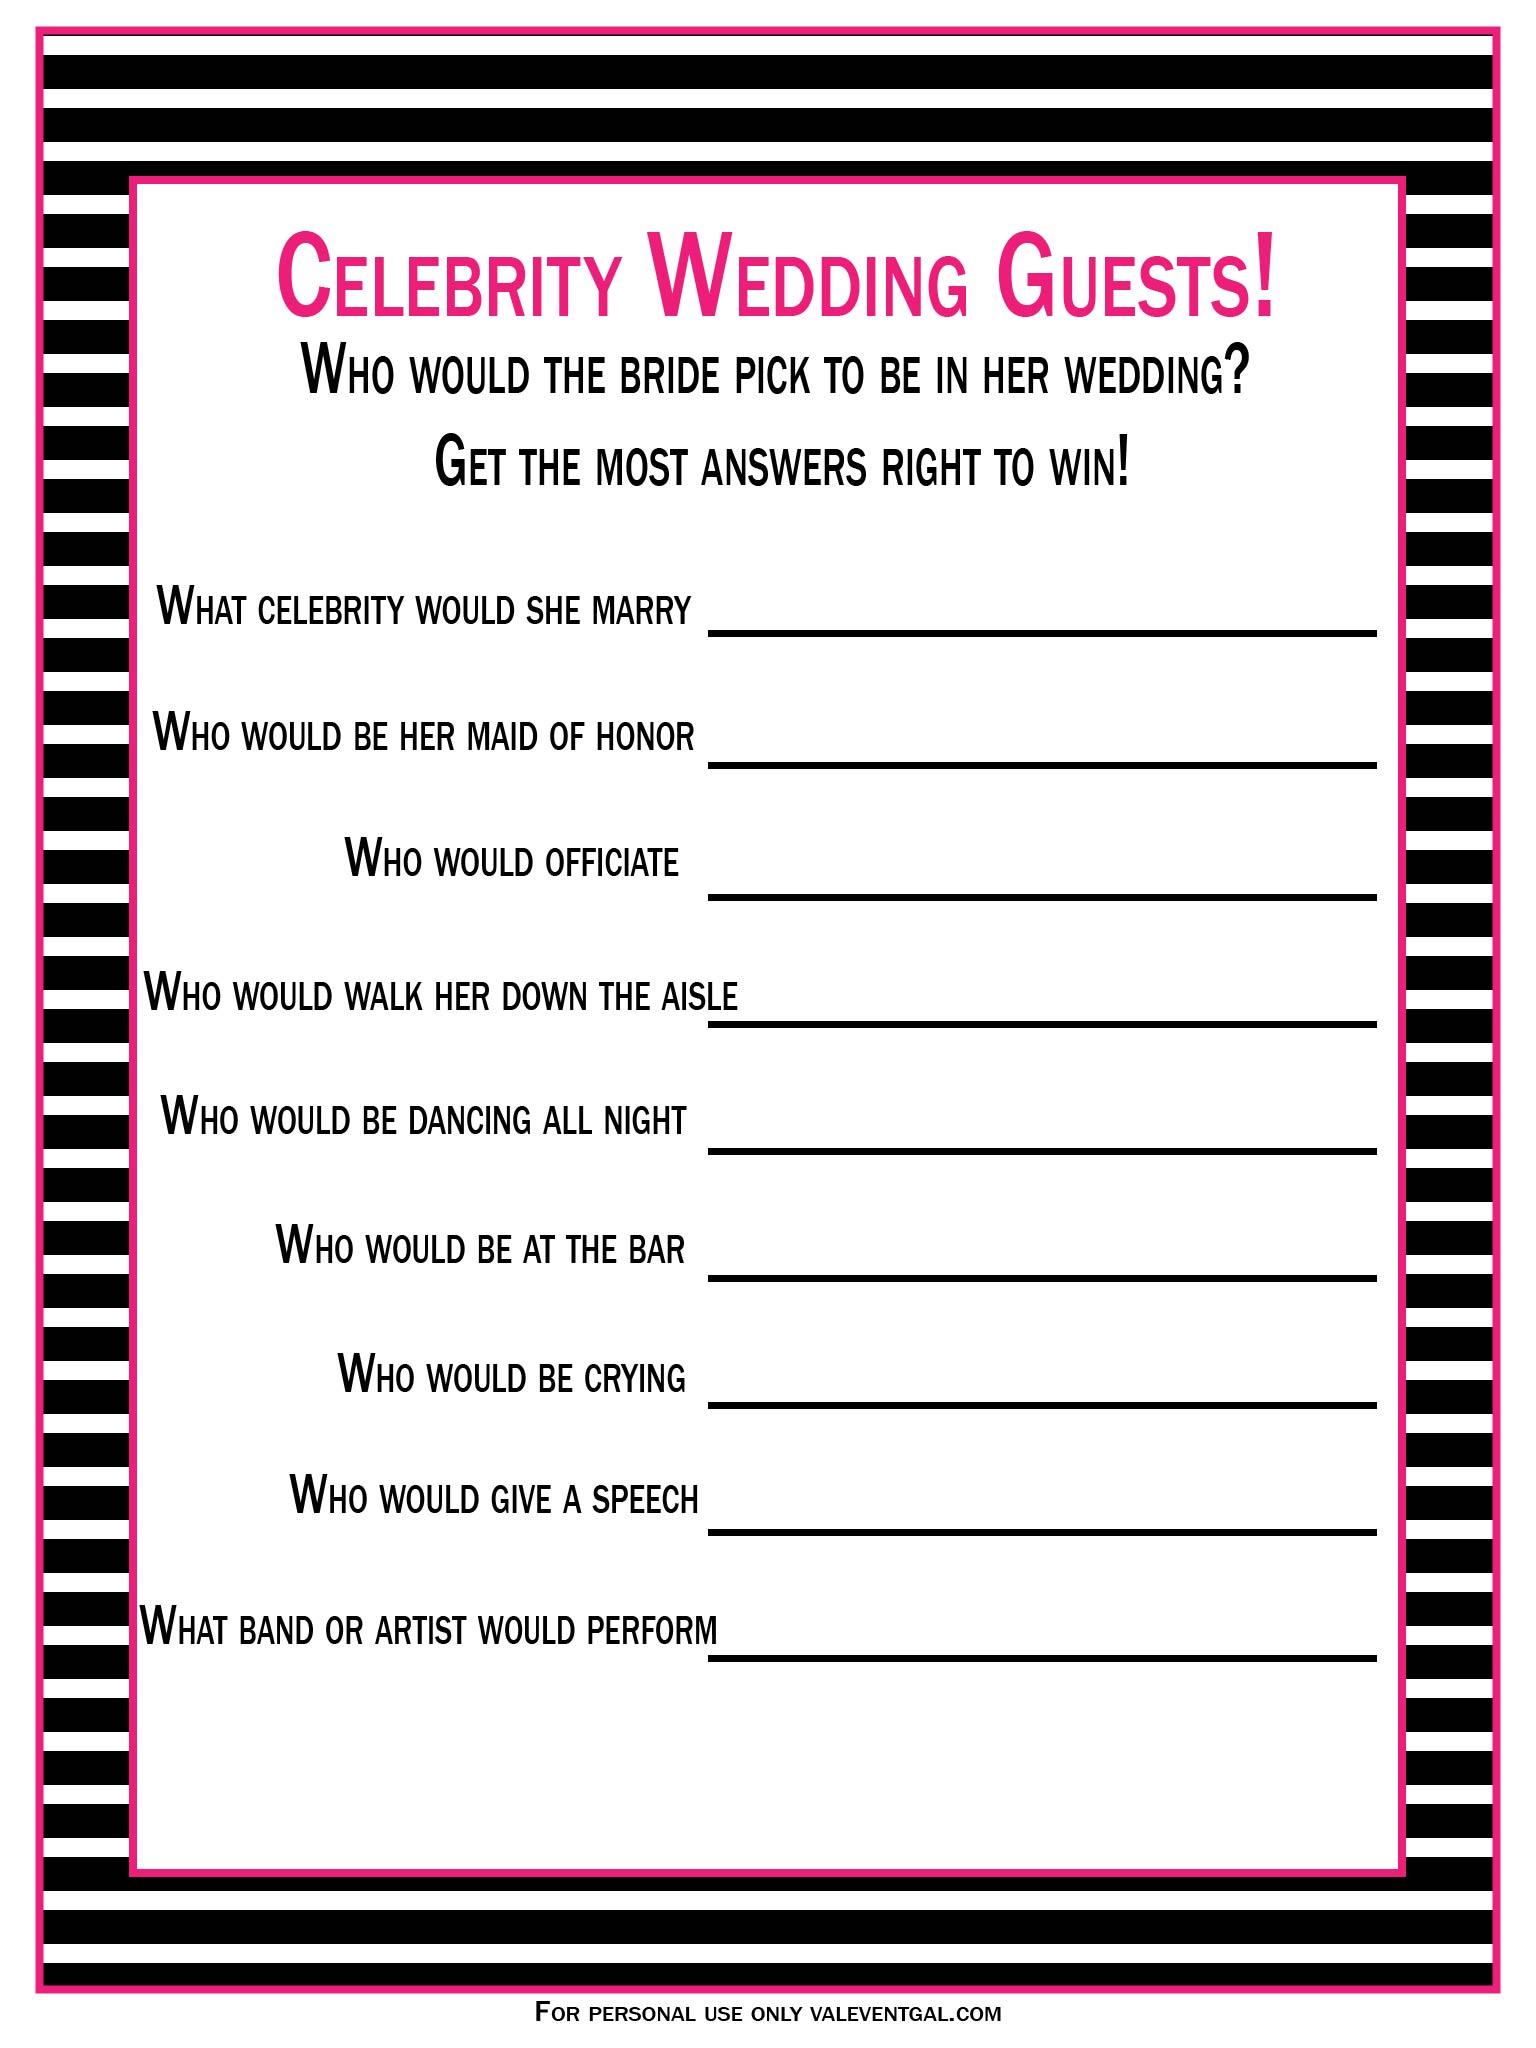 celebrity wedding guests game 01